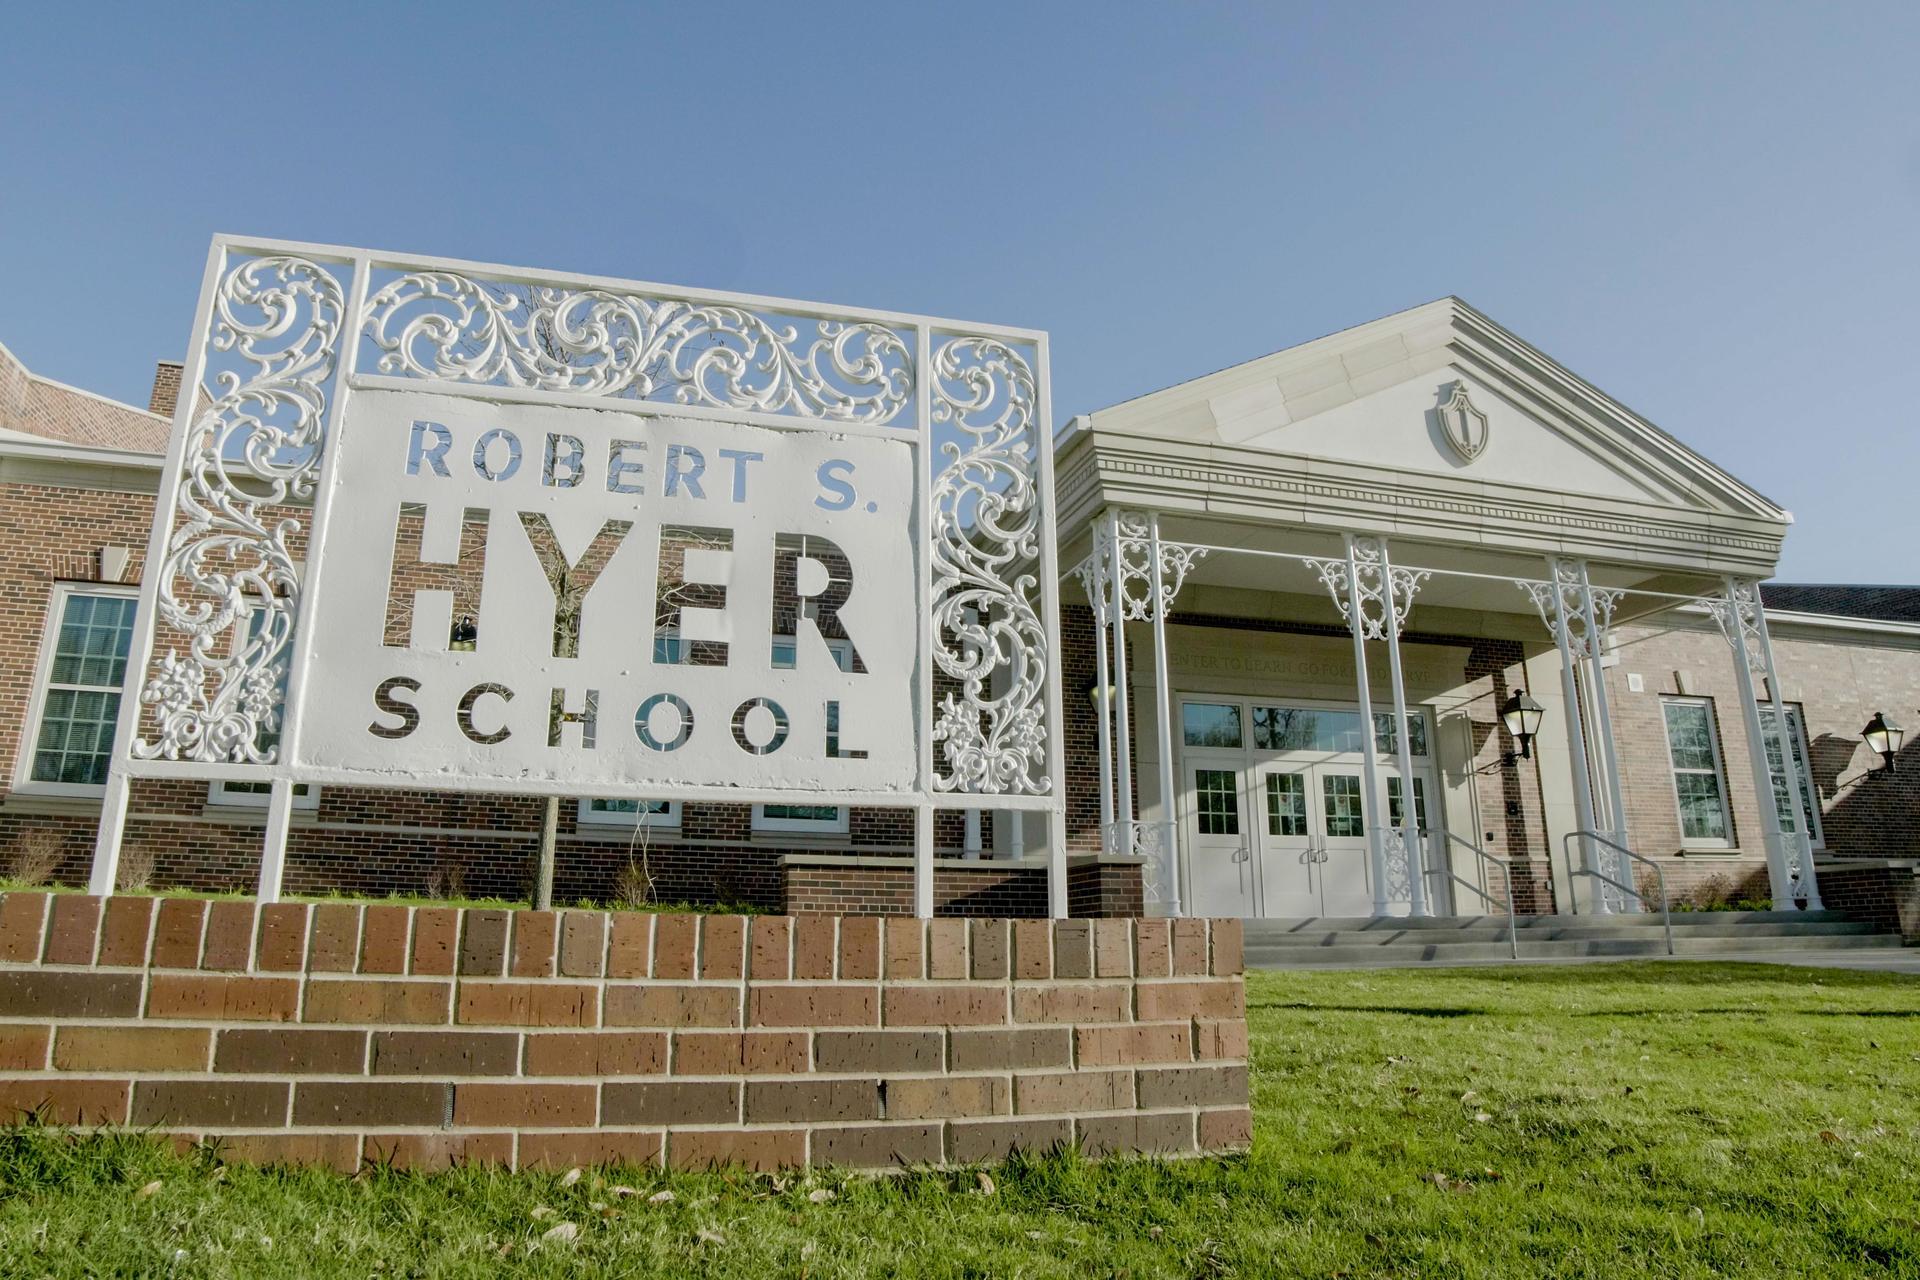 Hyer Elementary School front